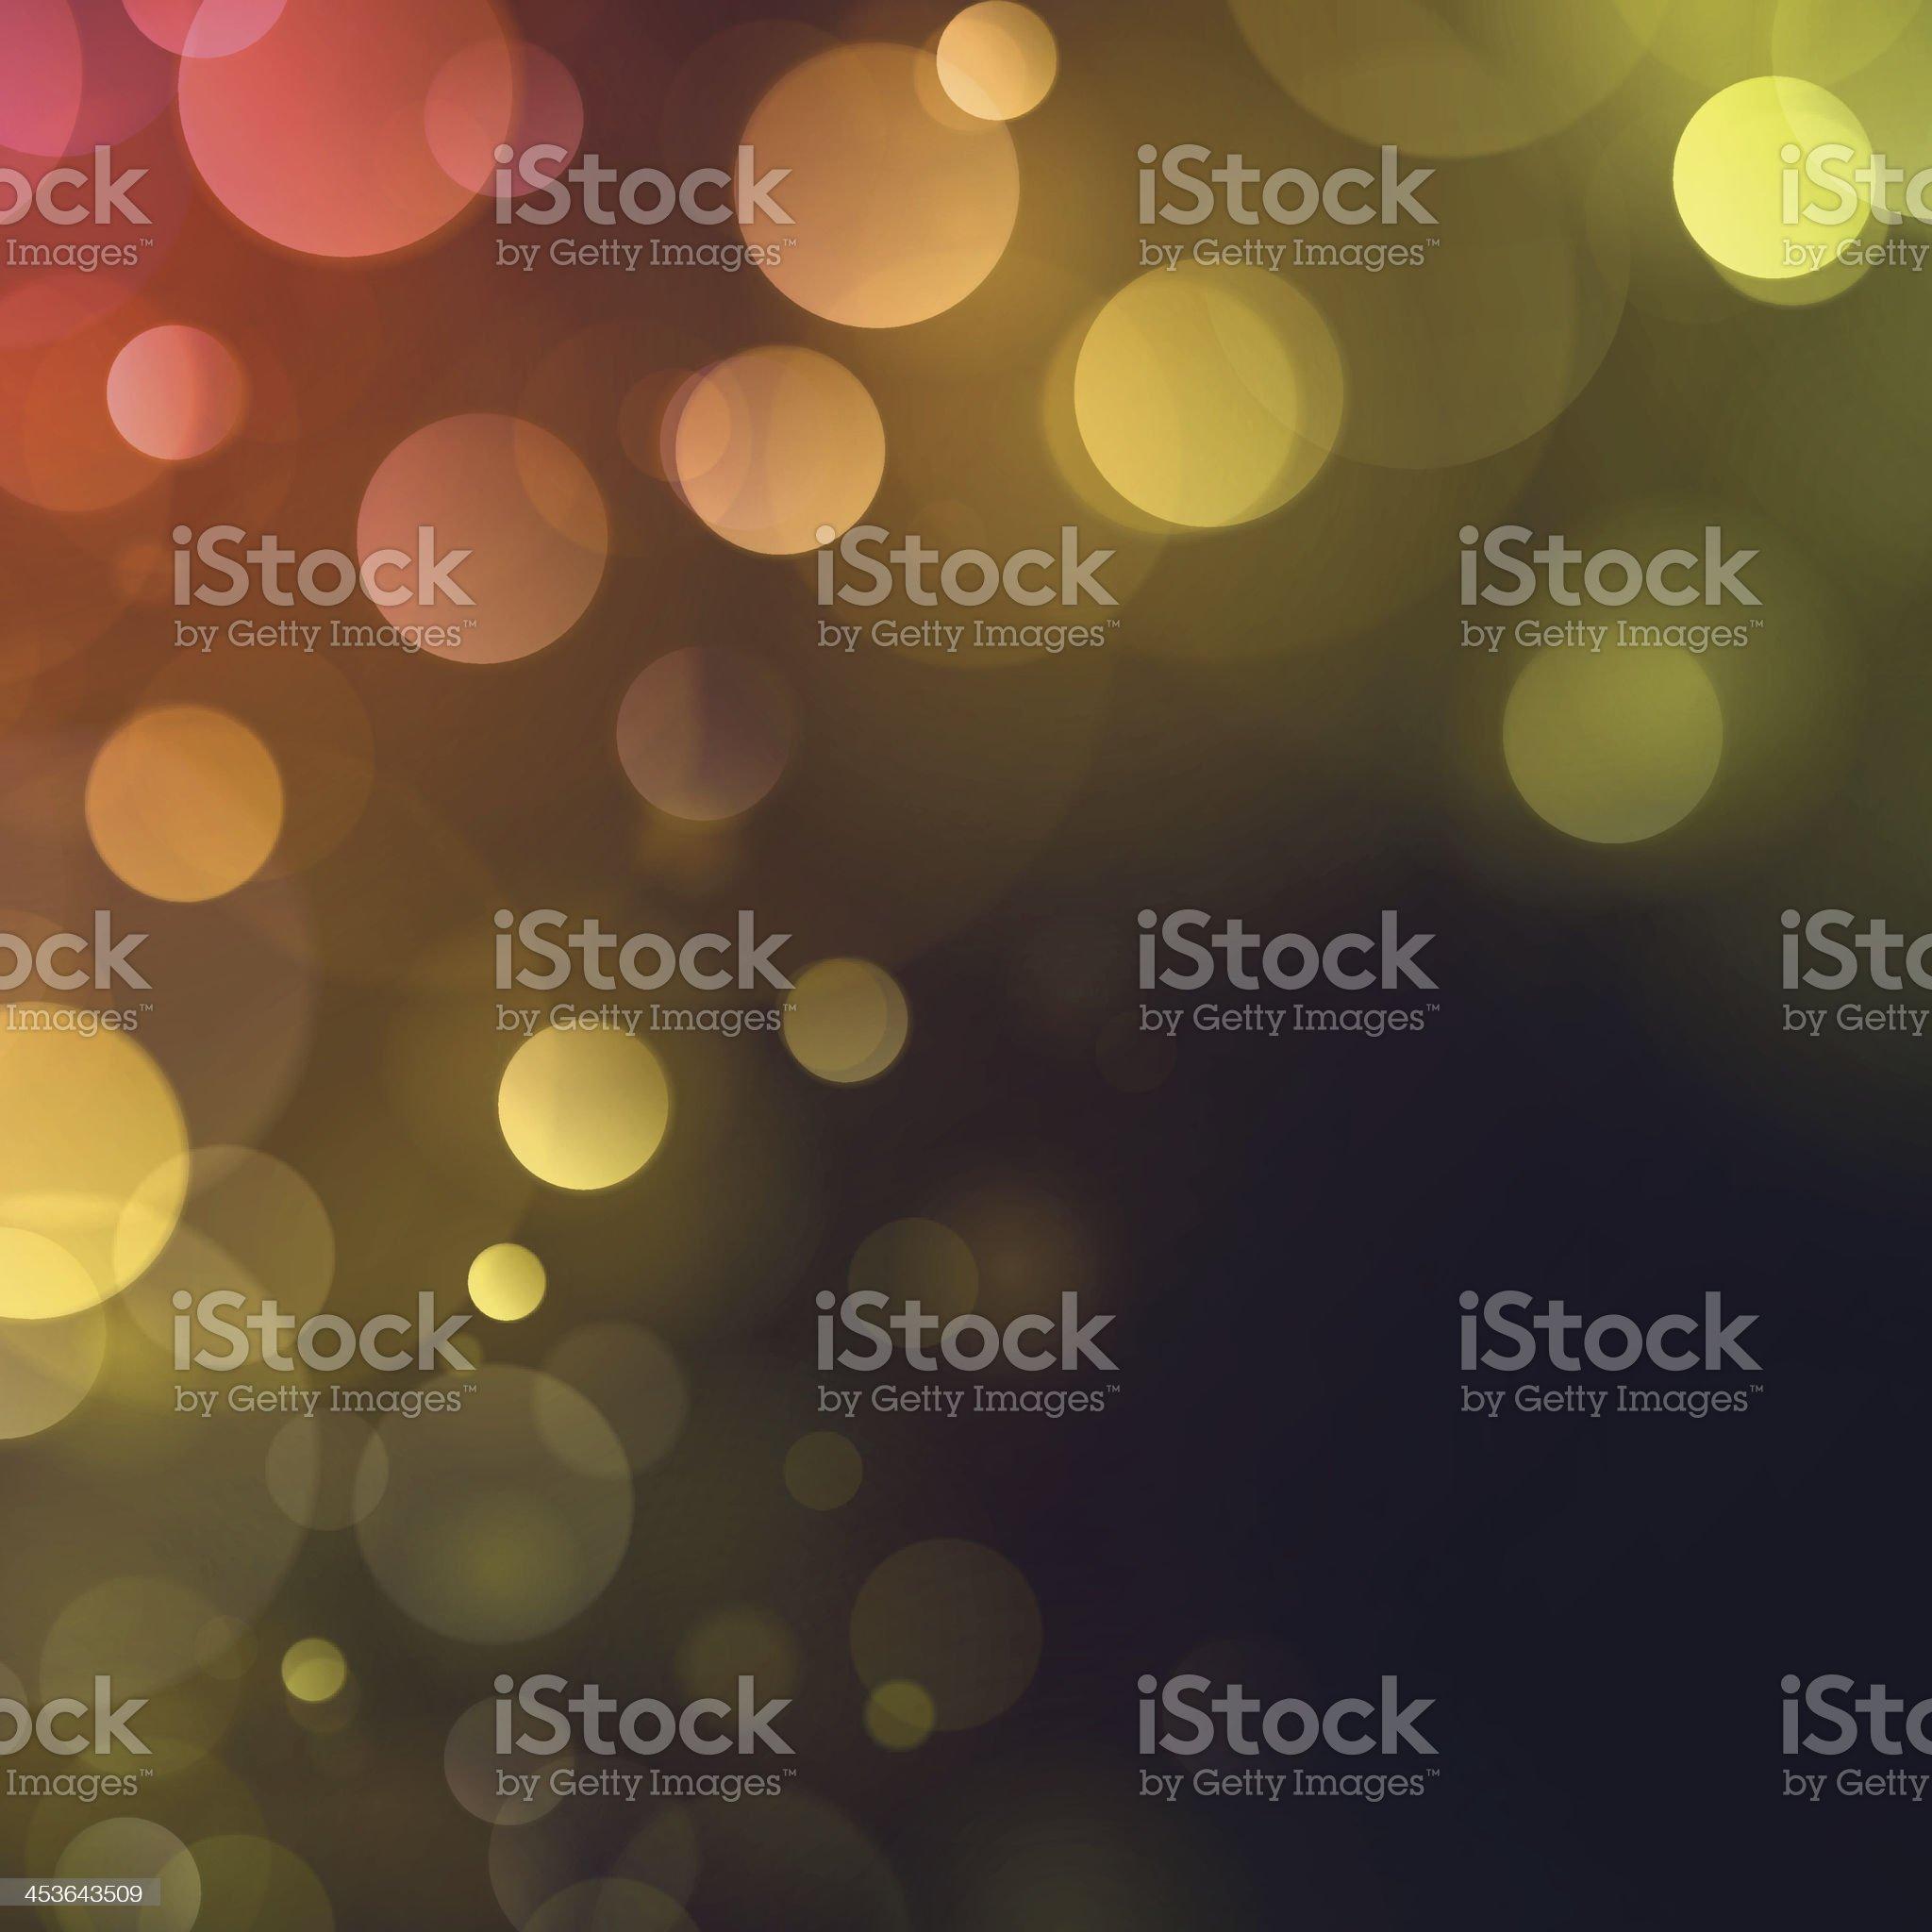 Vintage Autumn Fall Bokeh Defocus Blurry Lights Background royalty-free stock vector art